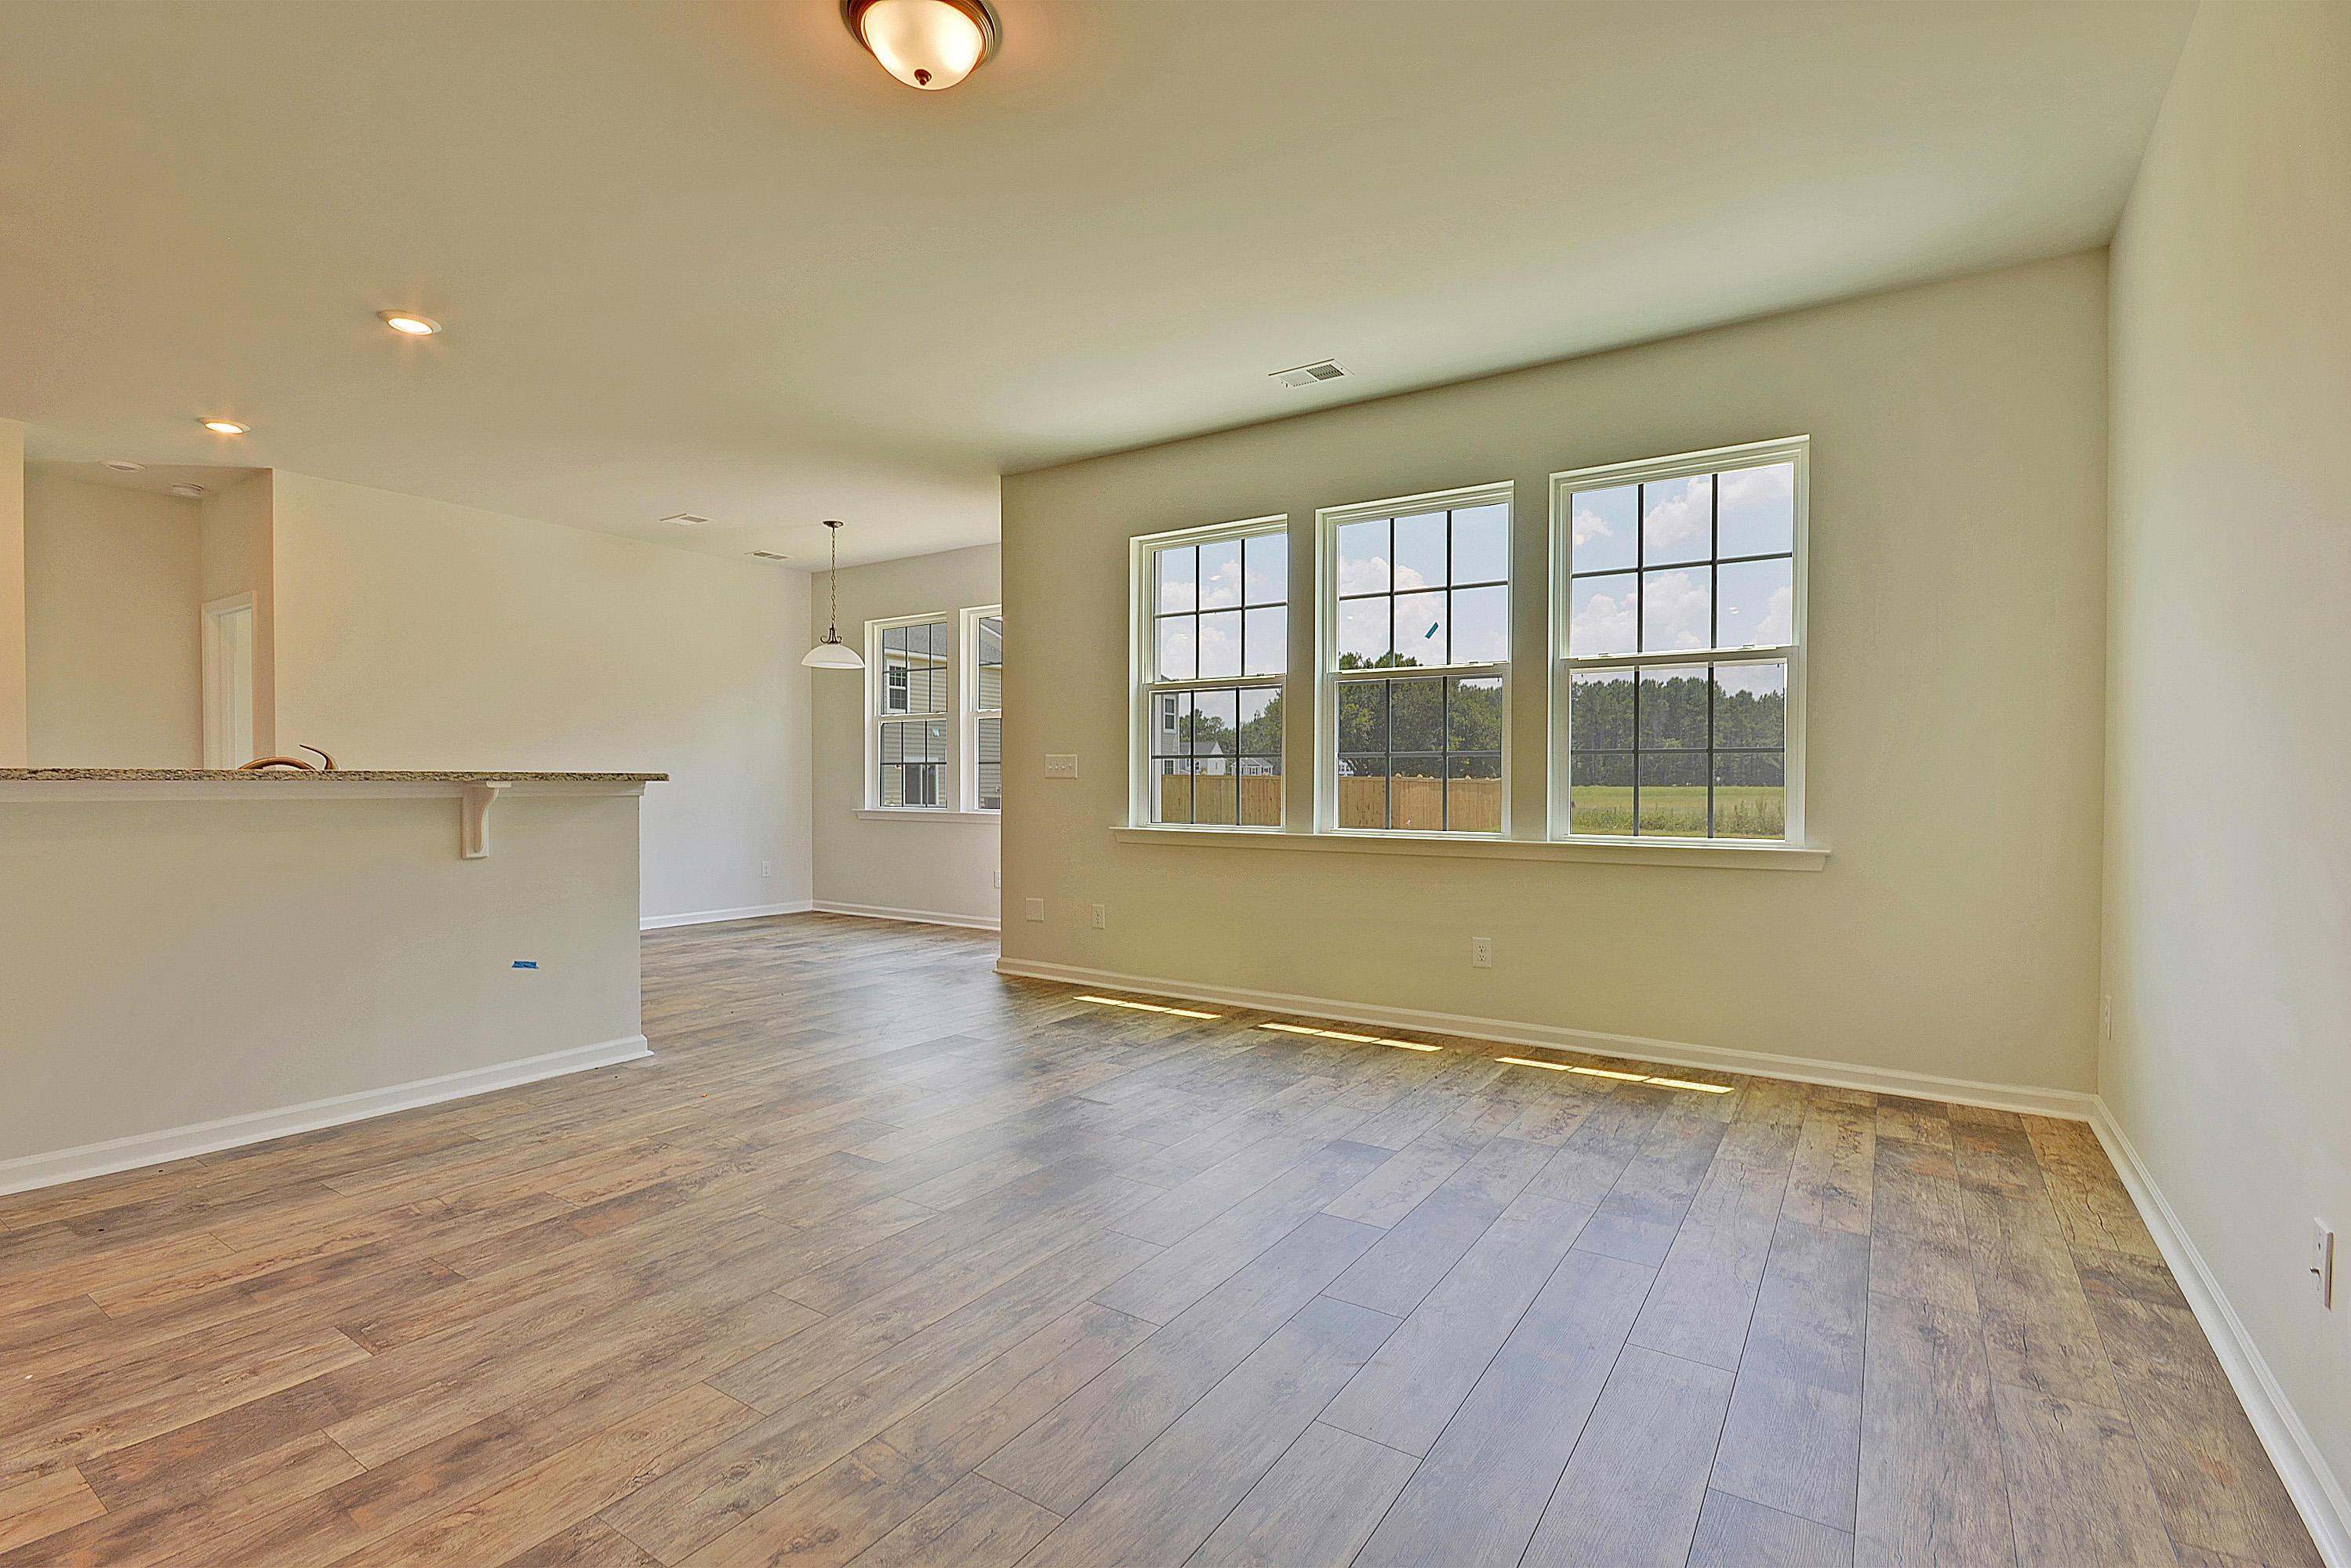 Coosaw Preserve Homes For Sale - 5162 Preserve Blvd, Ladson, SC - 22